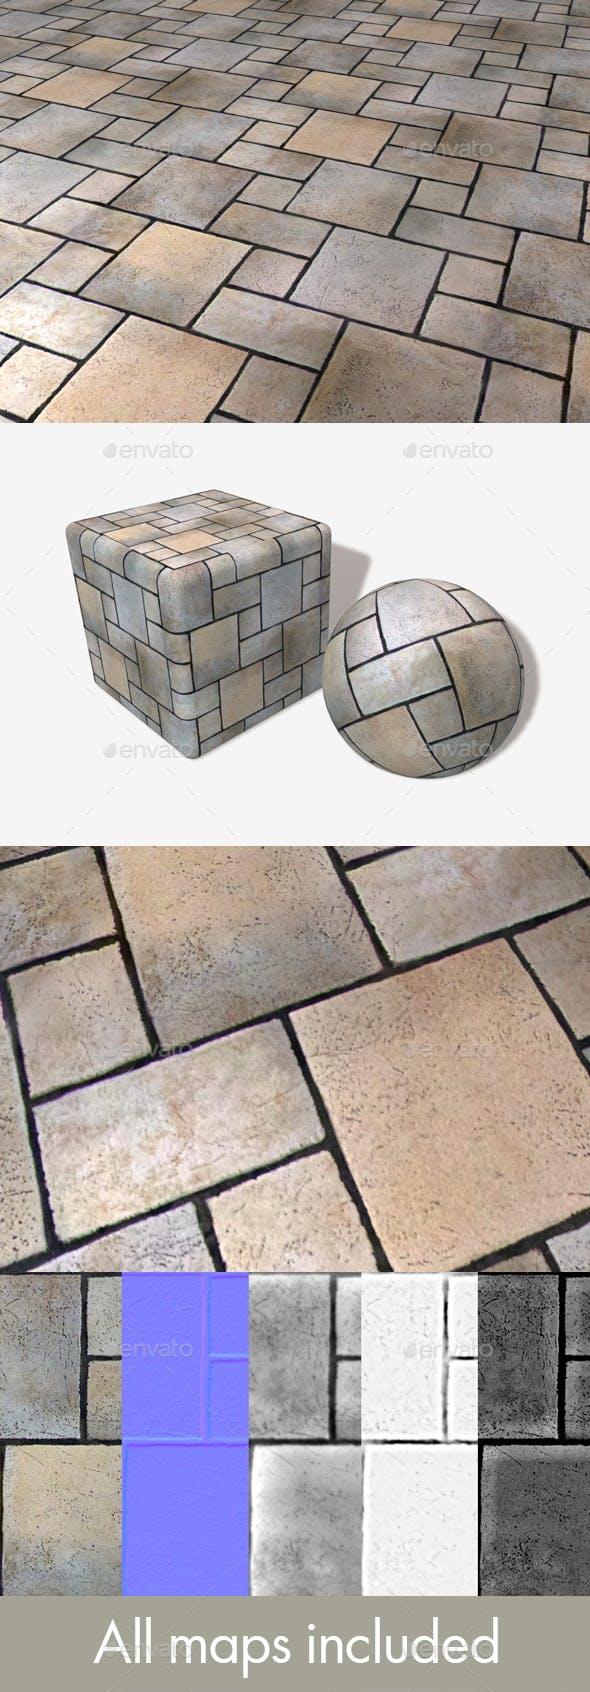 Restaurant Floor Tile Seamless Texture - 3DOcean Item for Sale